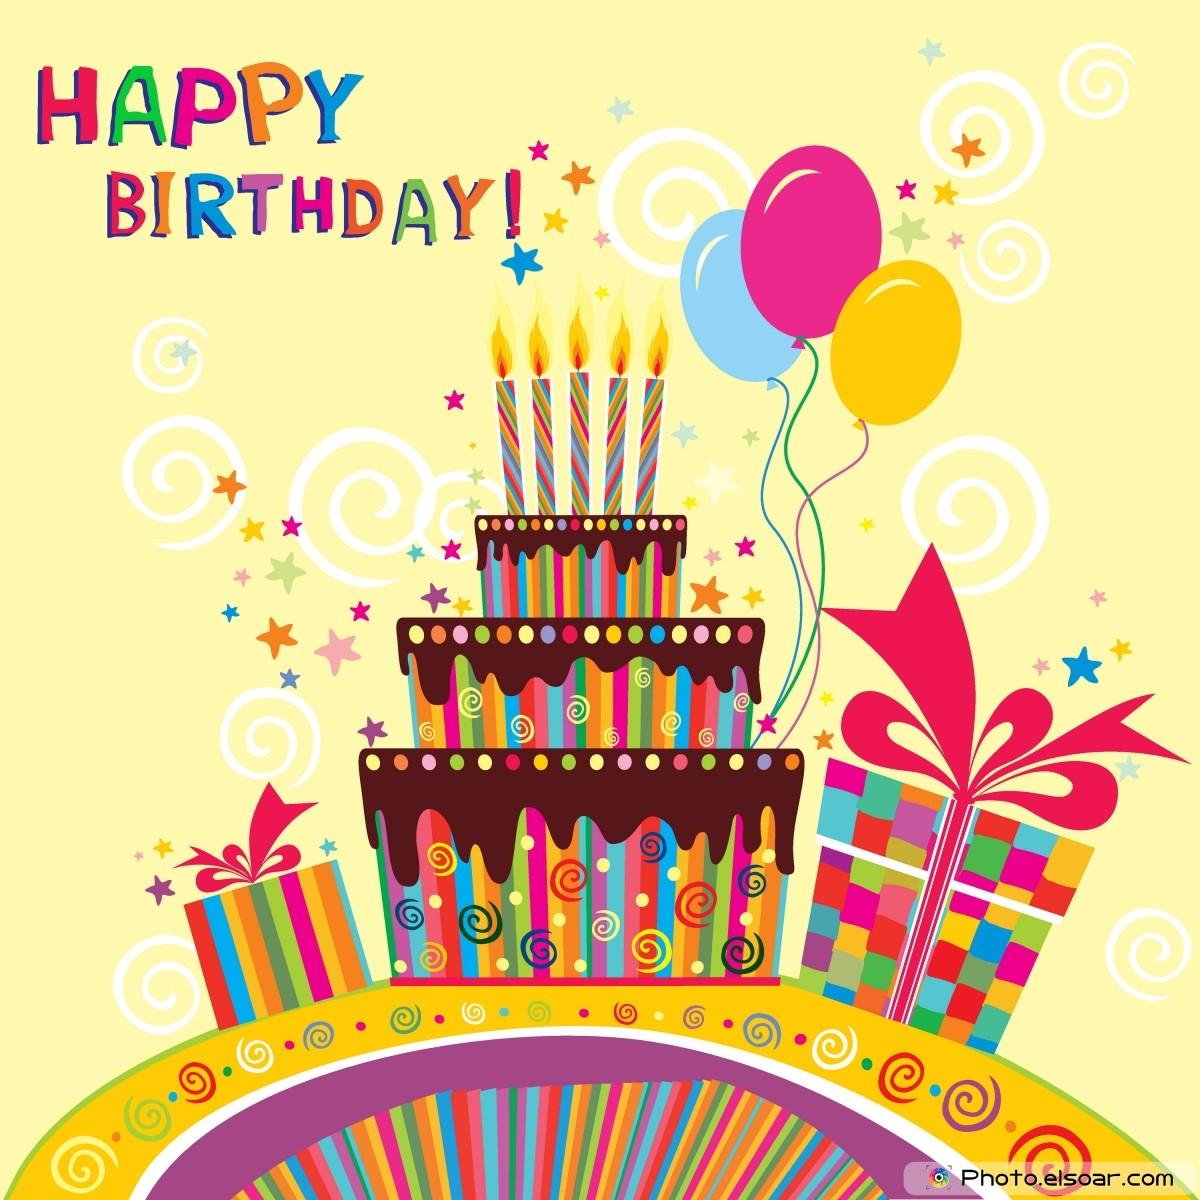 Happy Birthday Superb Greeting Card